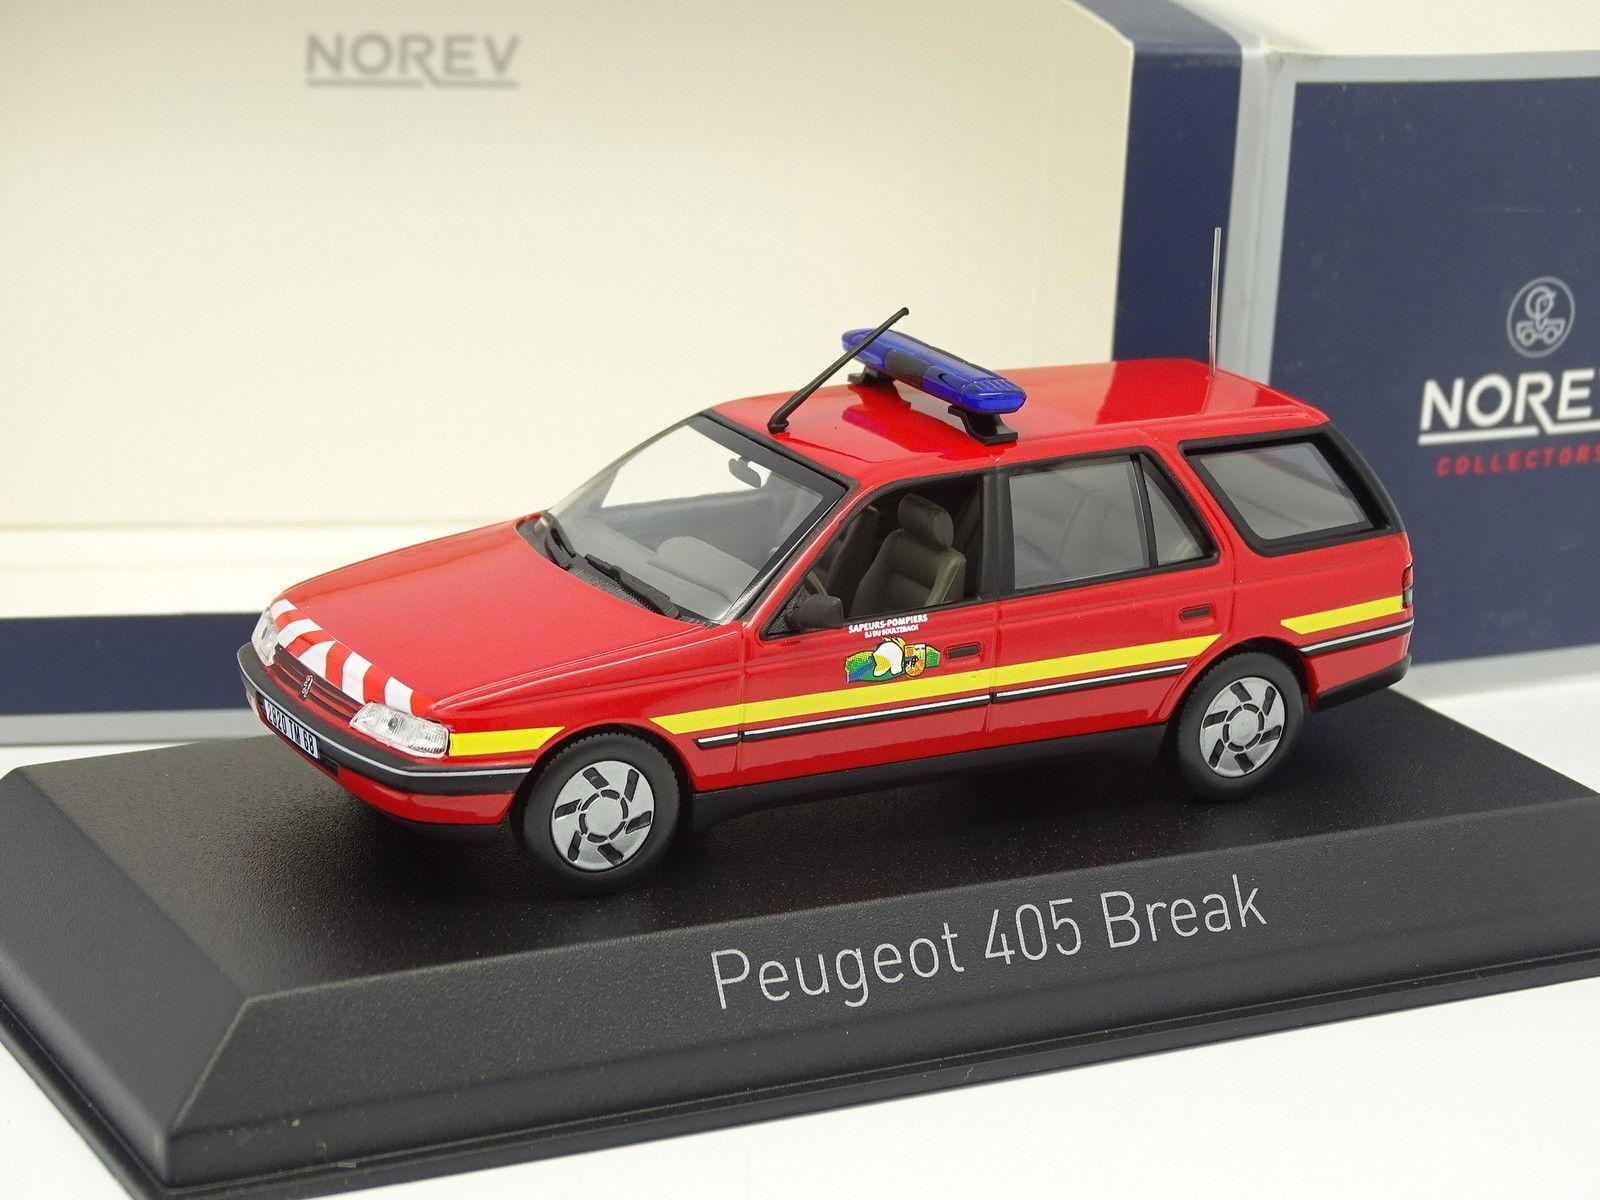 Norev 1 43 - Peugeot 405 Break Pompiers